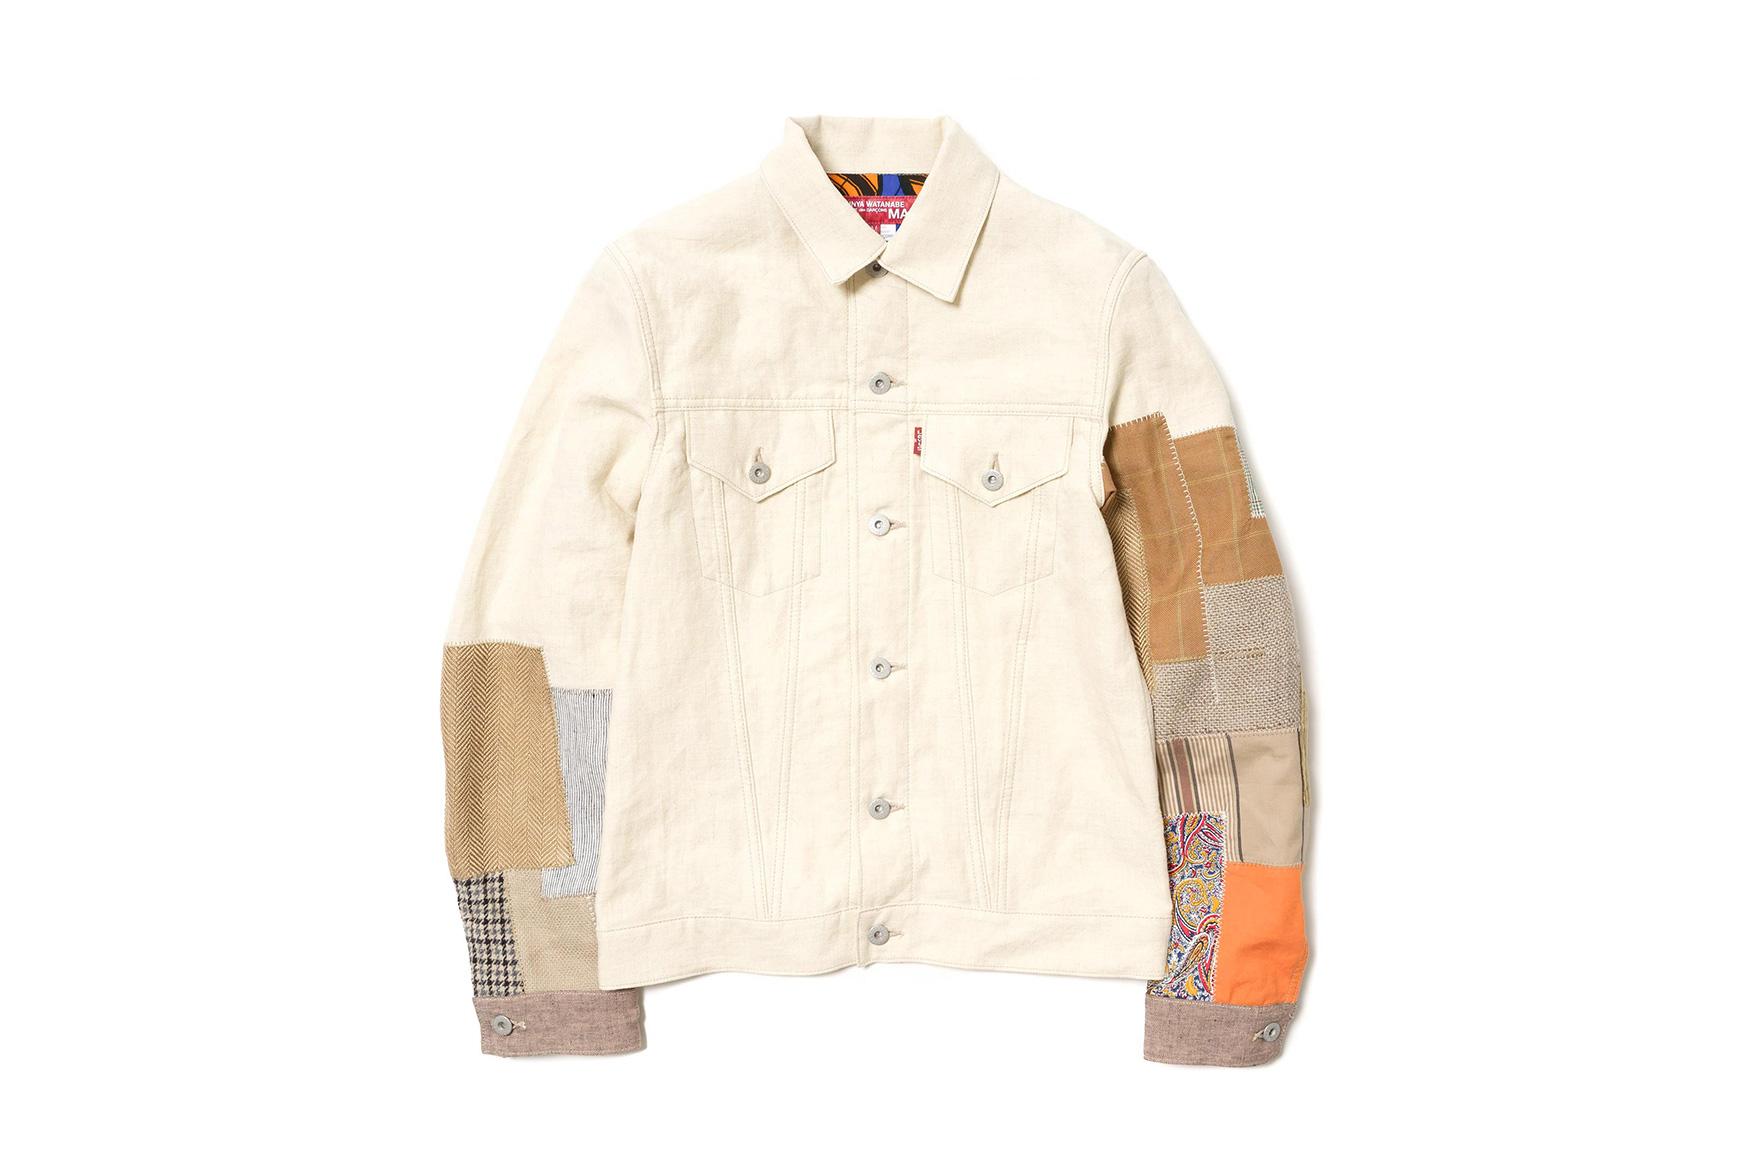 Junya Watanabe MAN Revamps the Levi's Hemp Linen Canvas Jacket